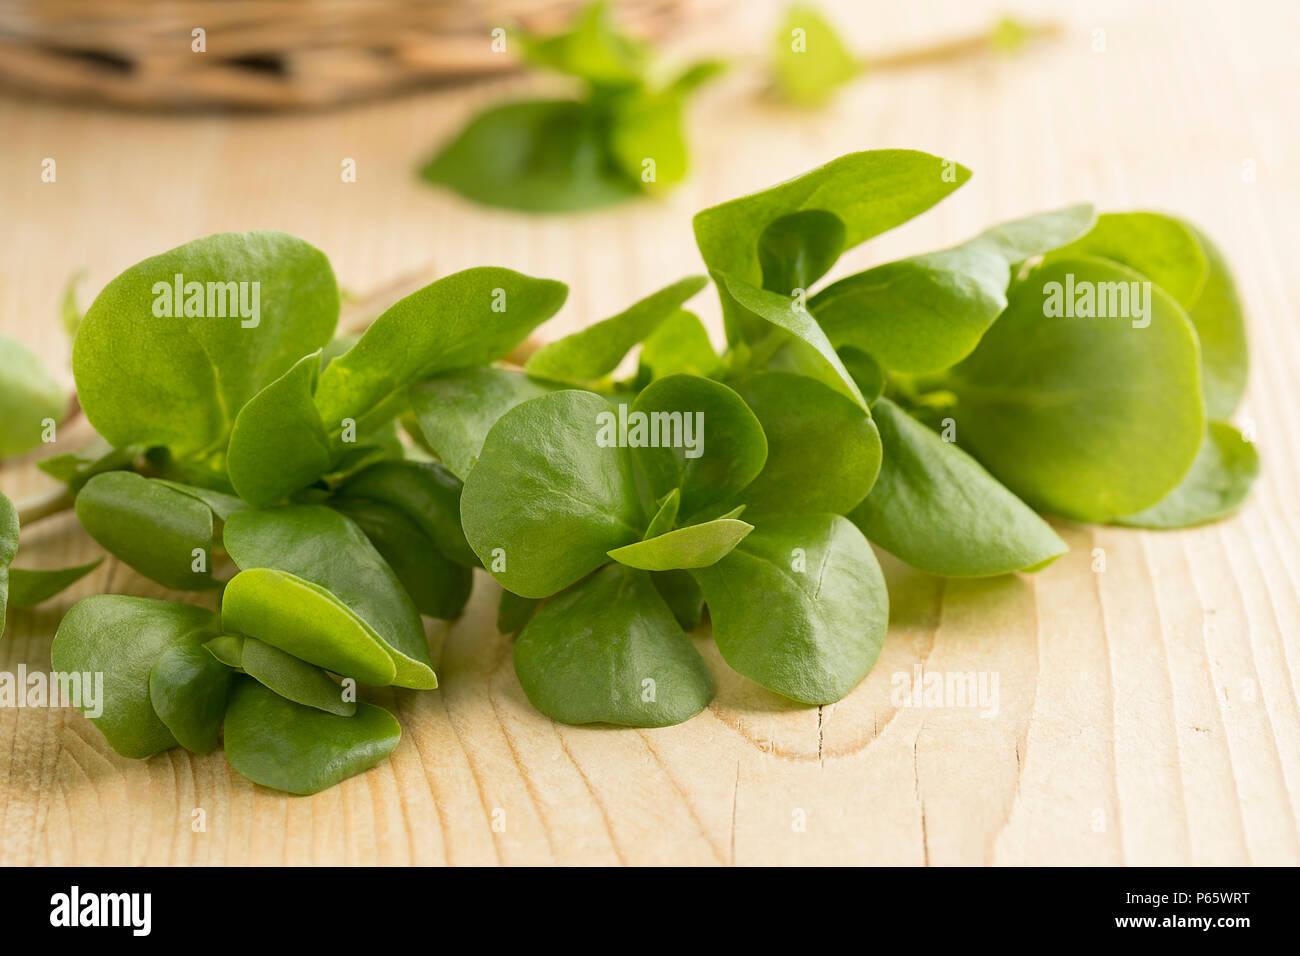 Twig of fresh raw common purslane leaves close up - Stock Image